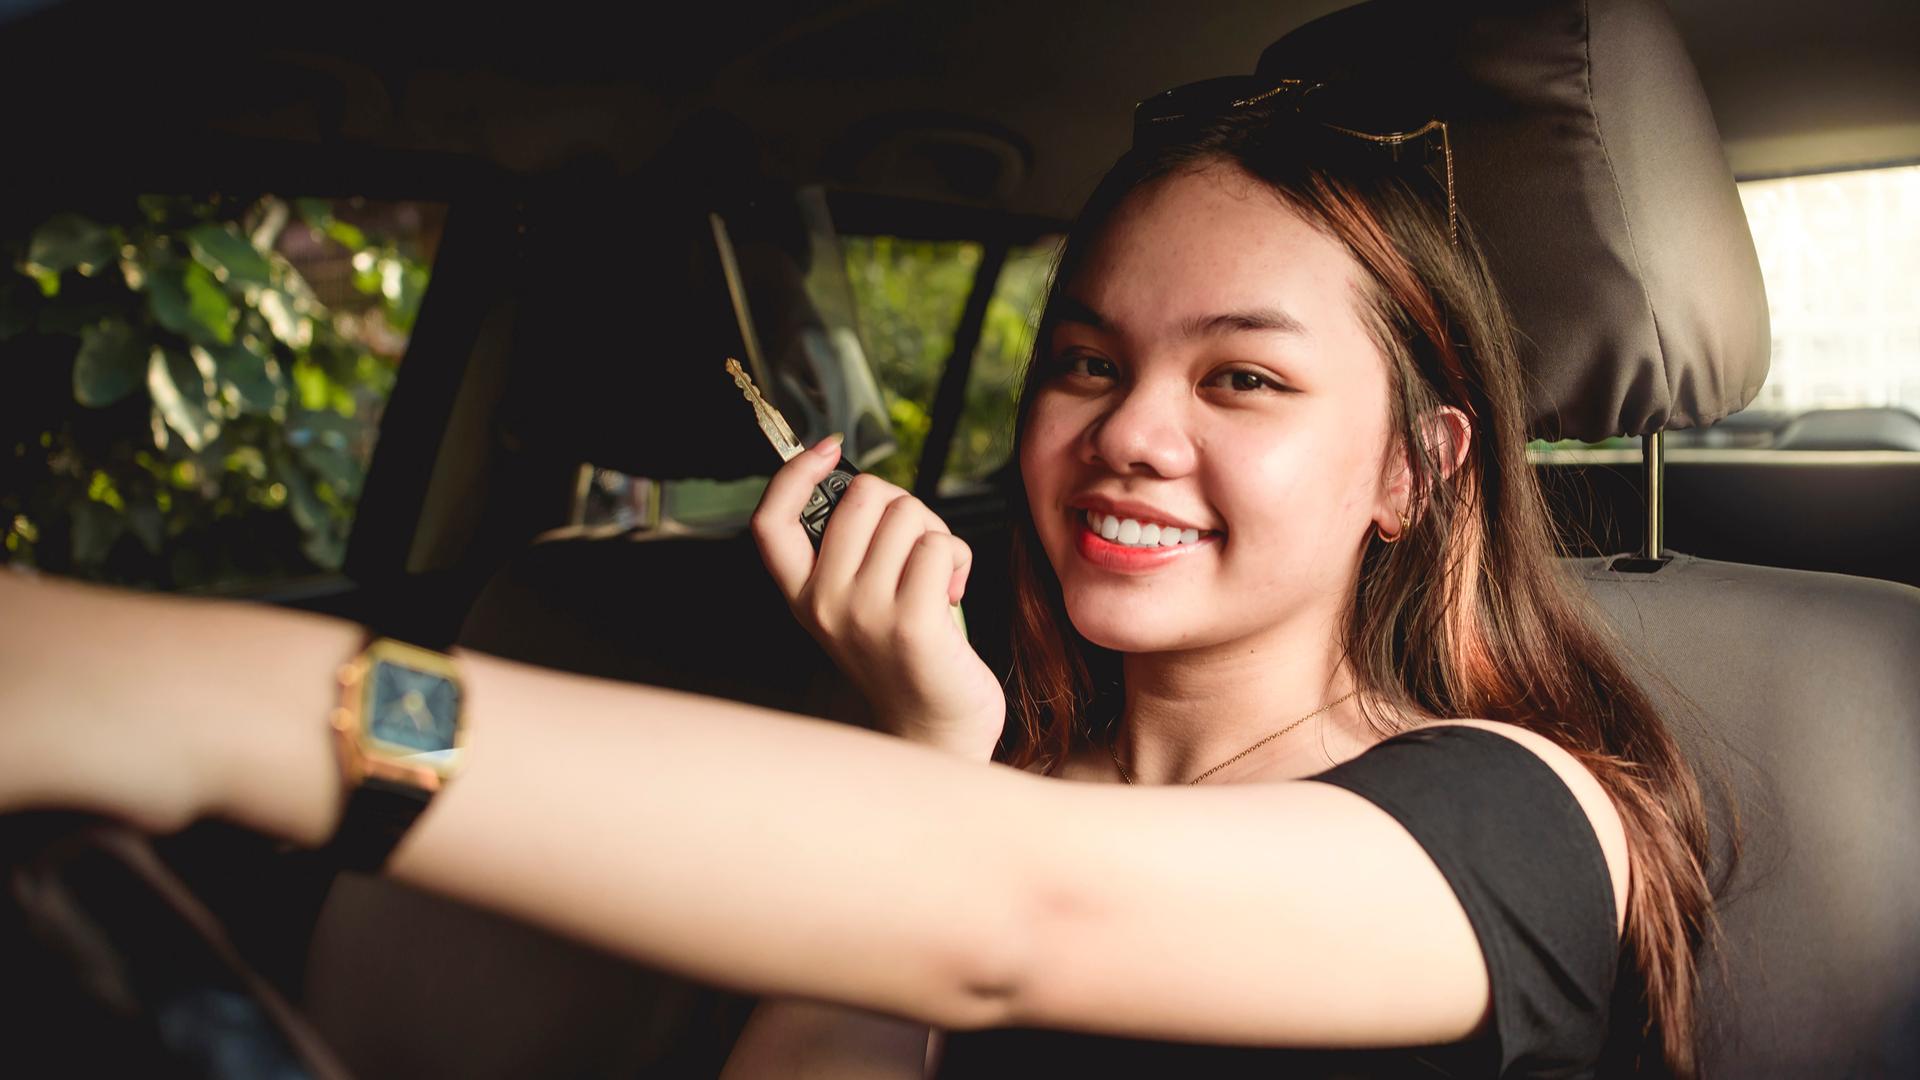 requisitos-conducir-sin-carnet